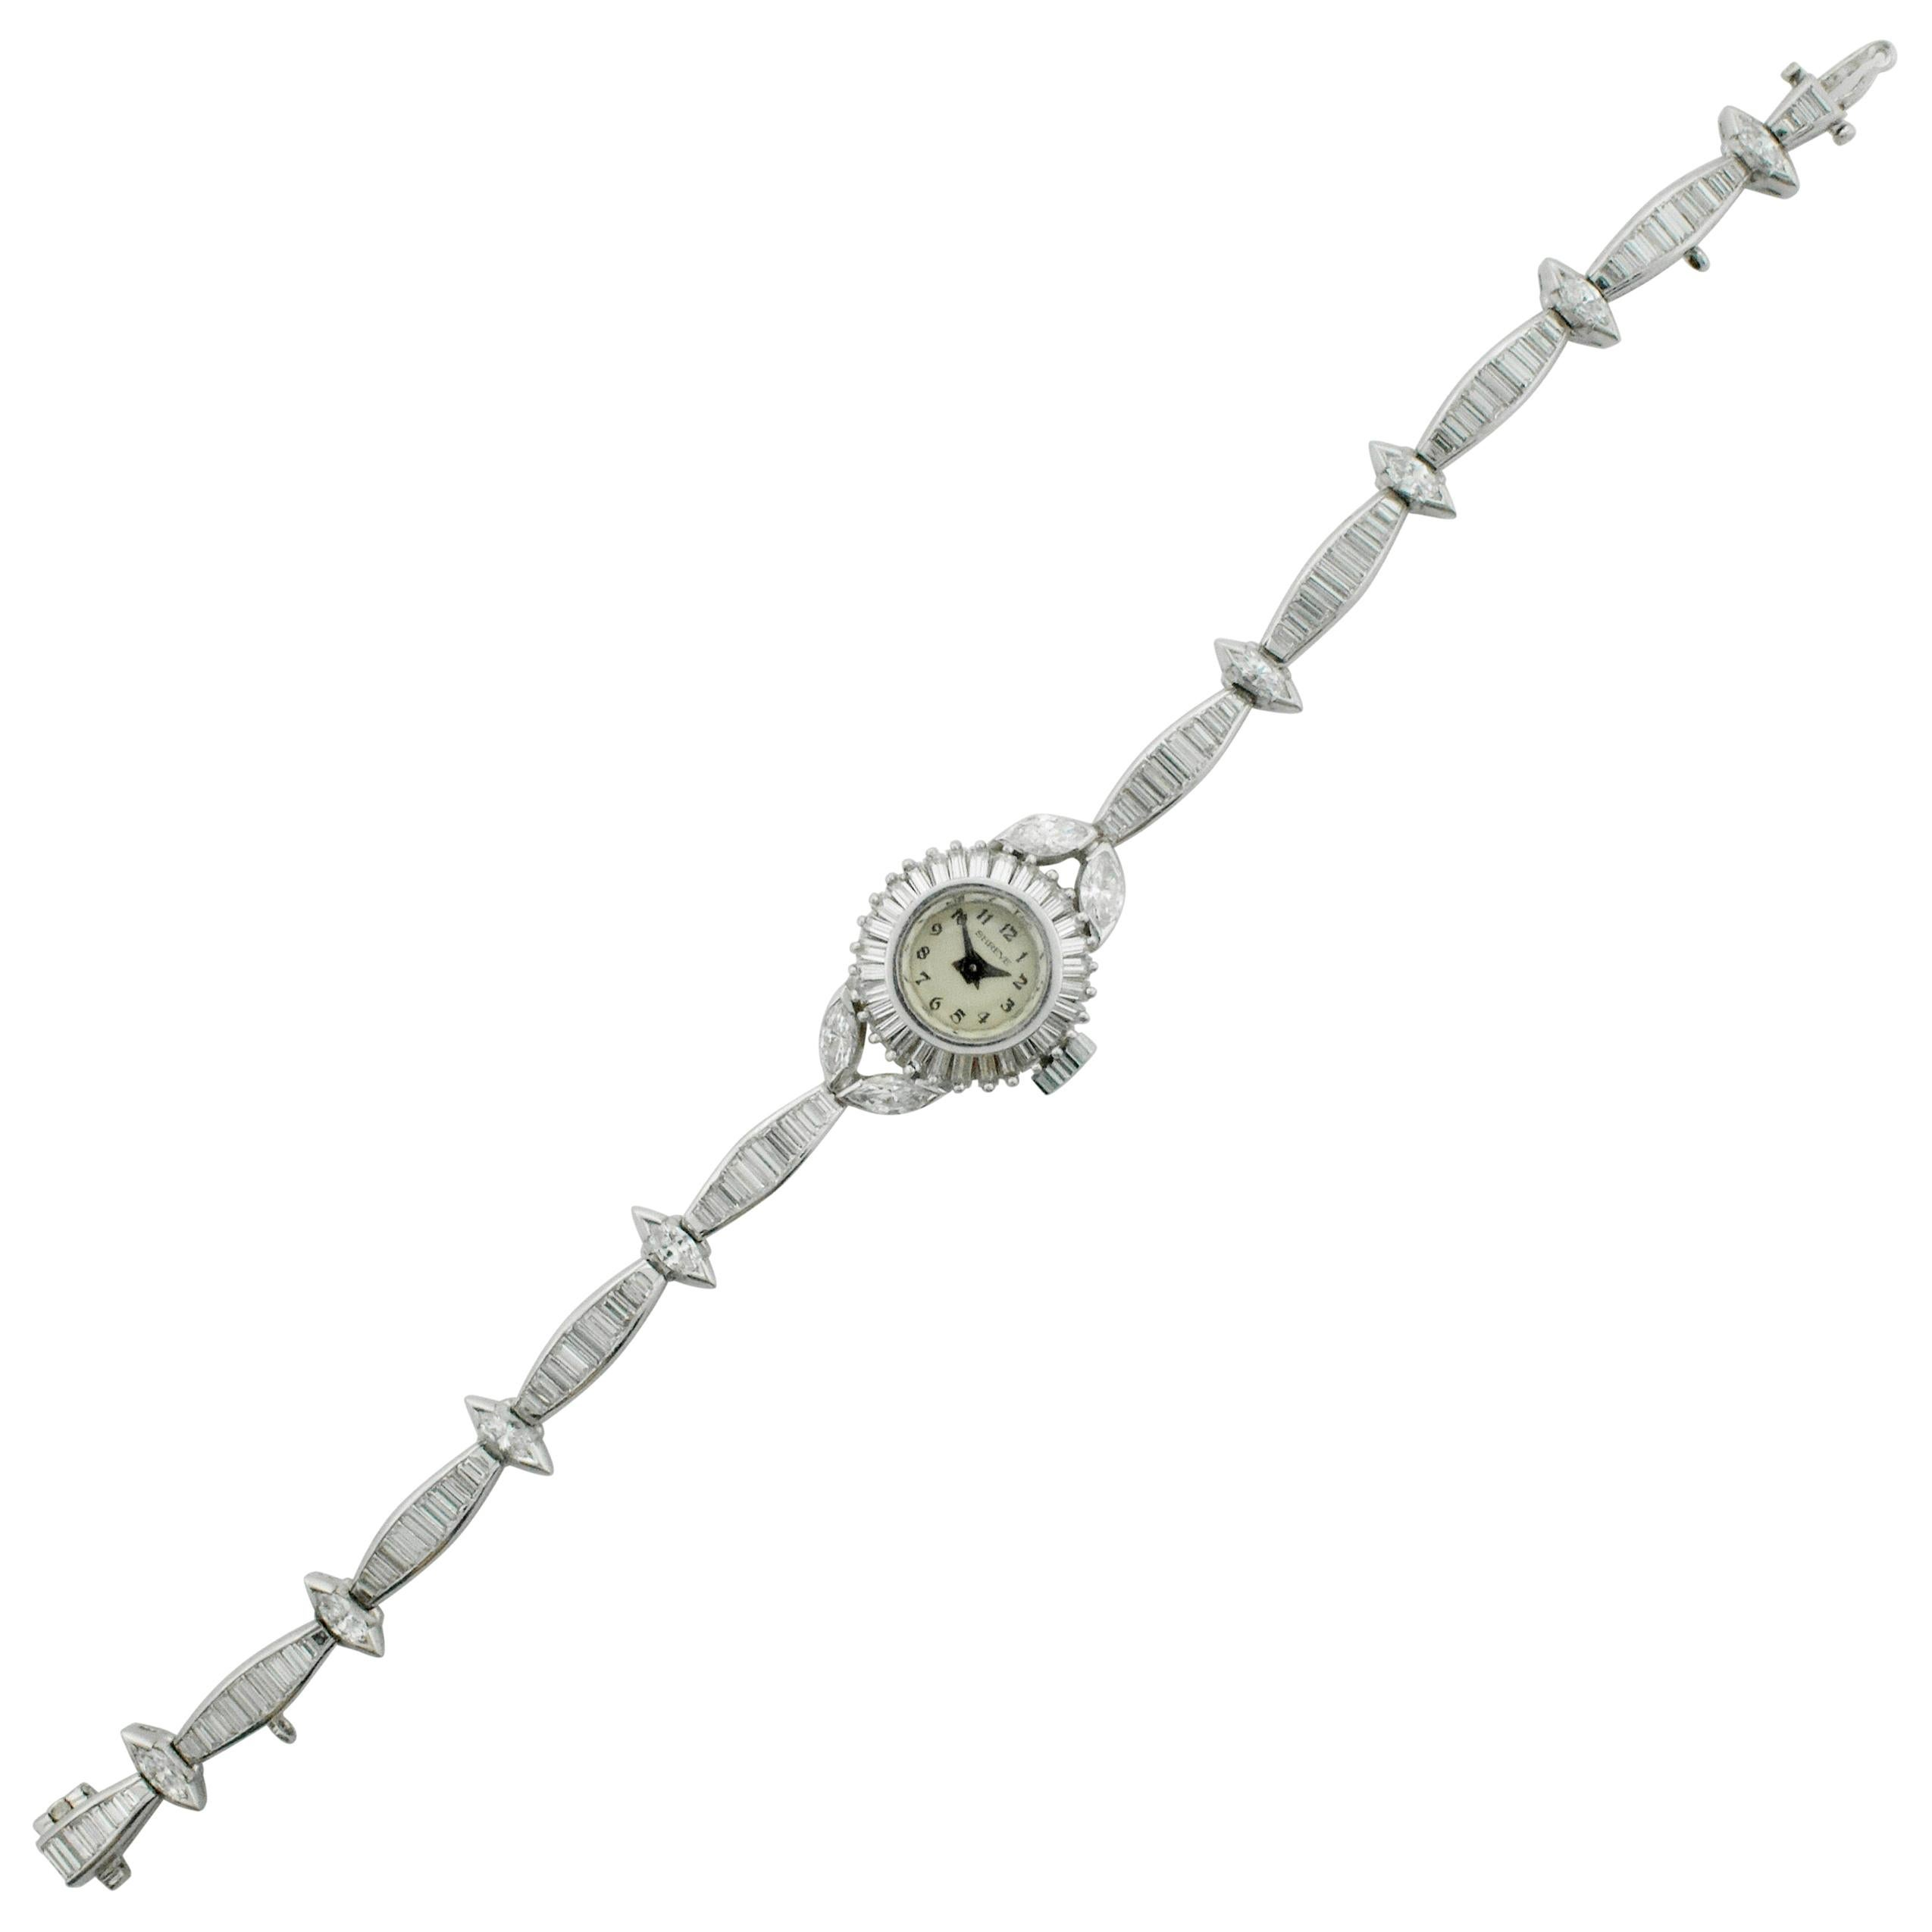 "1940s Platinum Diamond Watch ""Shreve and Company"" 5.50 Carat"